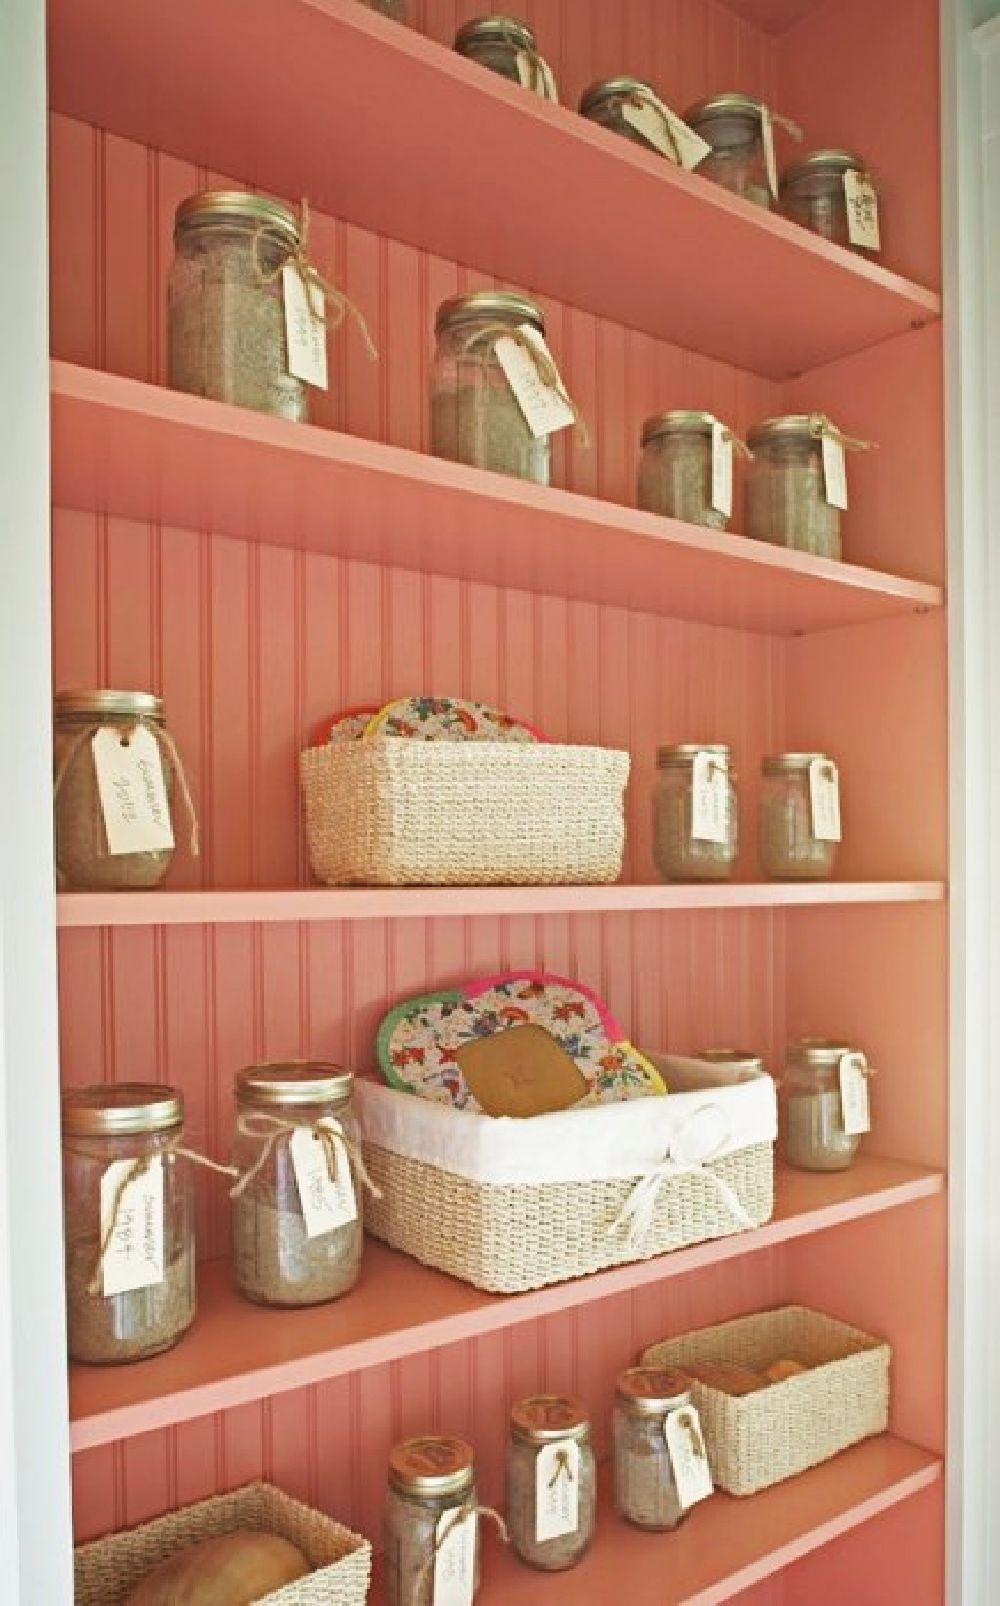 adelaparvu.com despre casa in Hamptons, arhitectura Historical Concept, designer interior Steven Gambrel, Foto Marco Ricca (2)